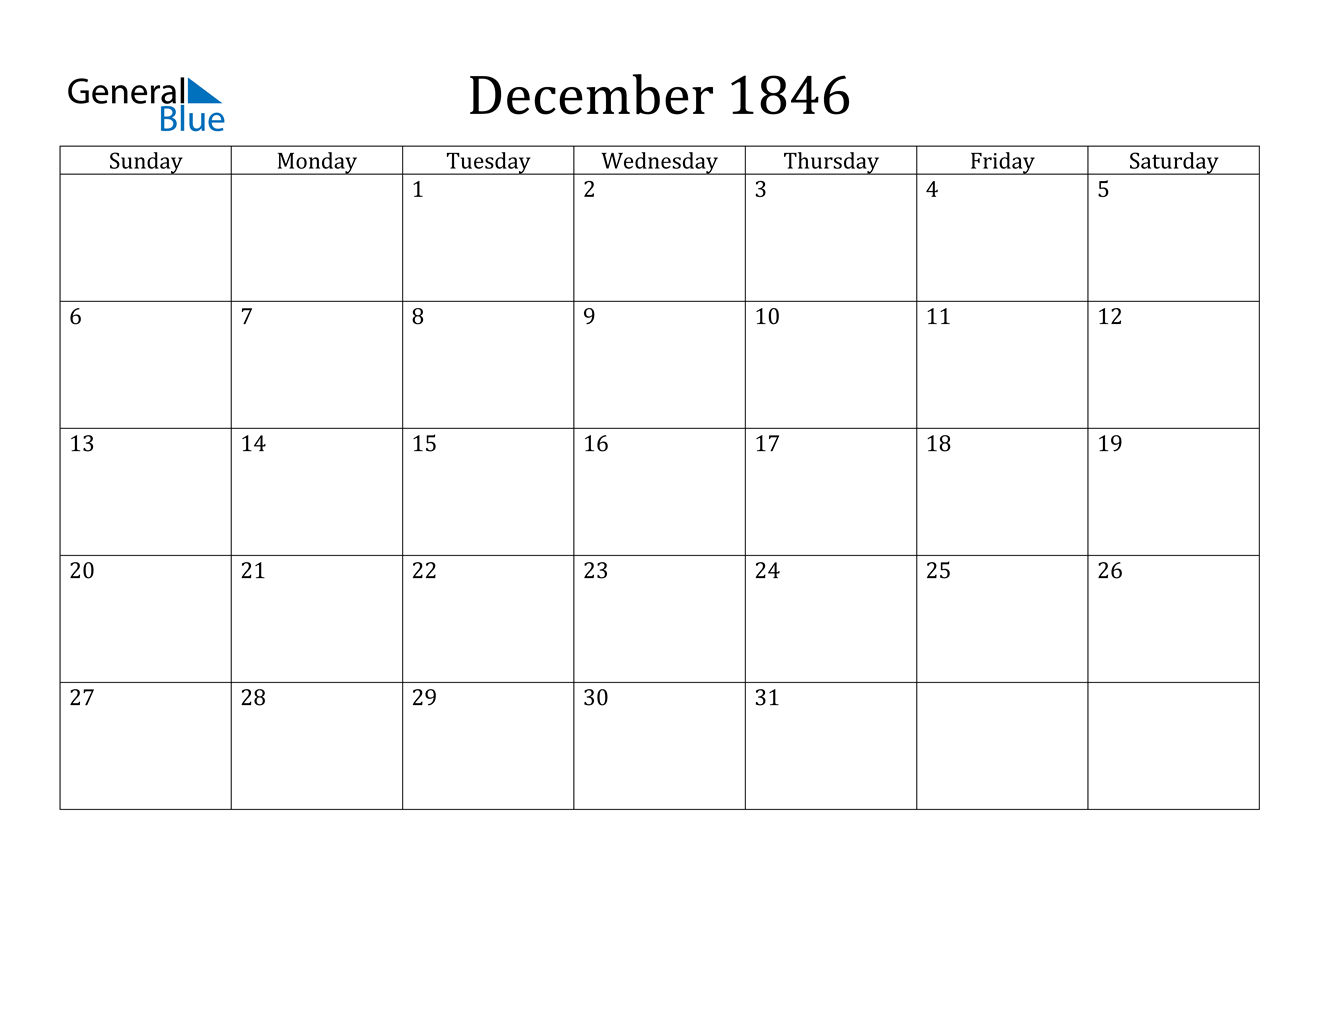 Image of December 1846 Calendar